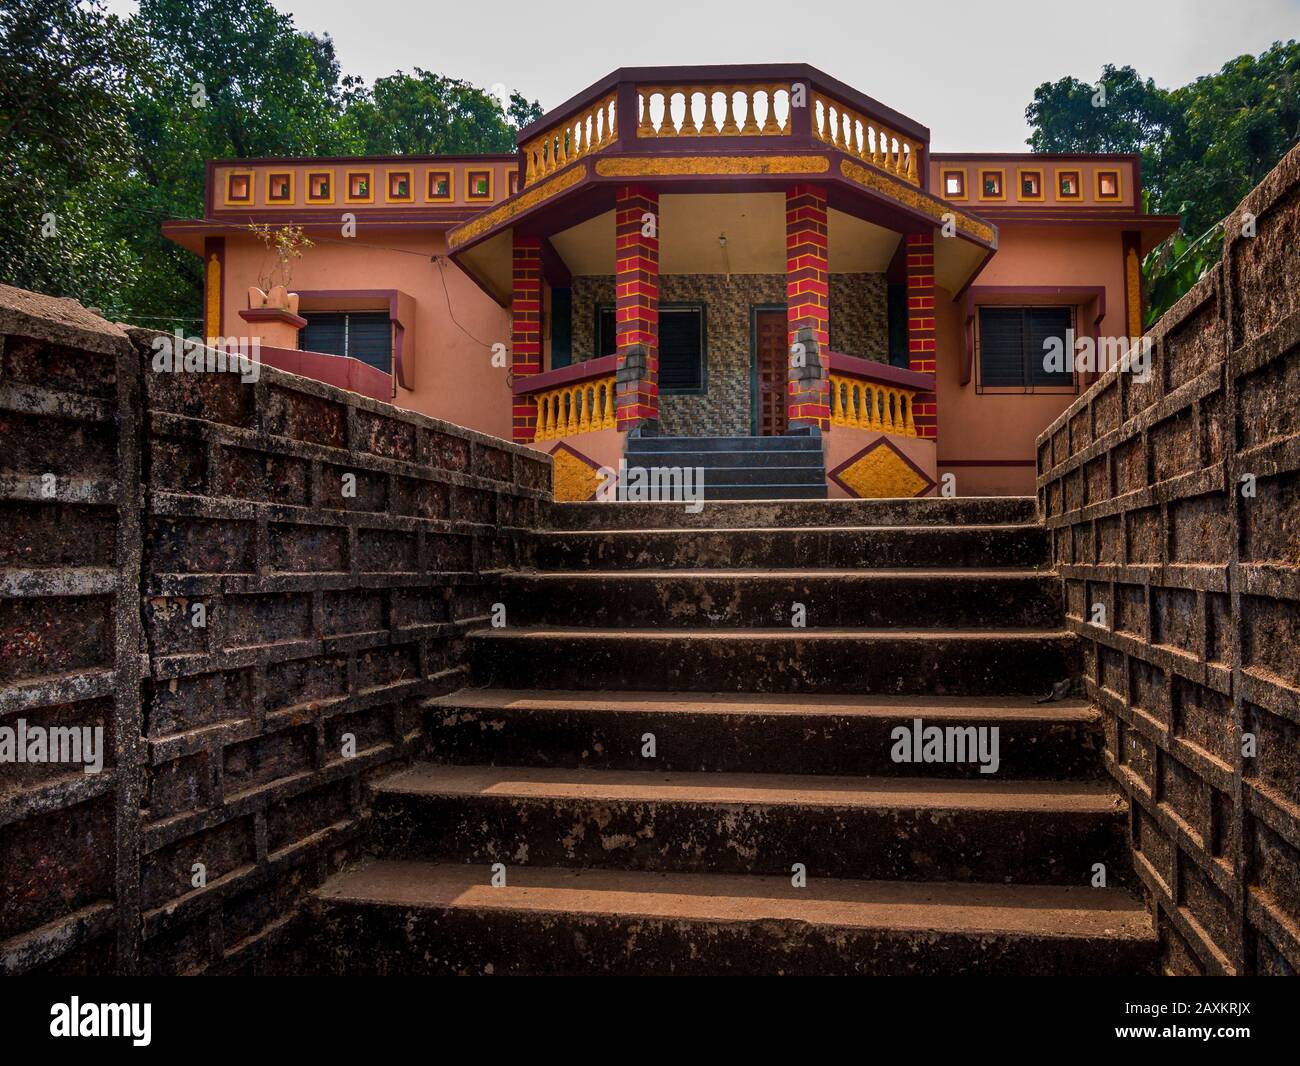 Indian House With Traditional Roof Design At Coastal Side Of Maharashtra India Stock Photo Alamy